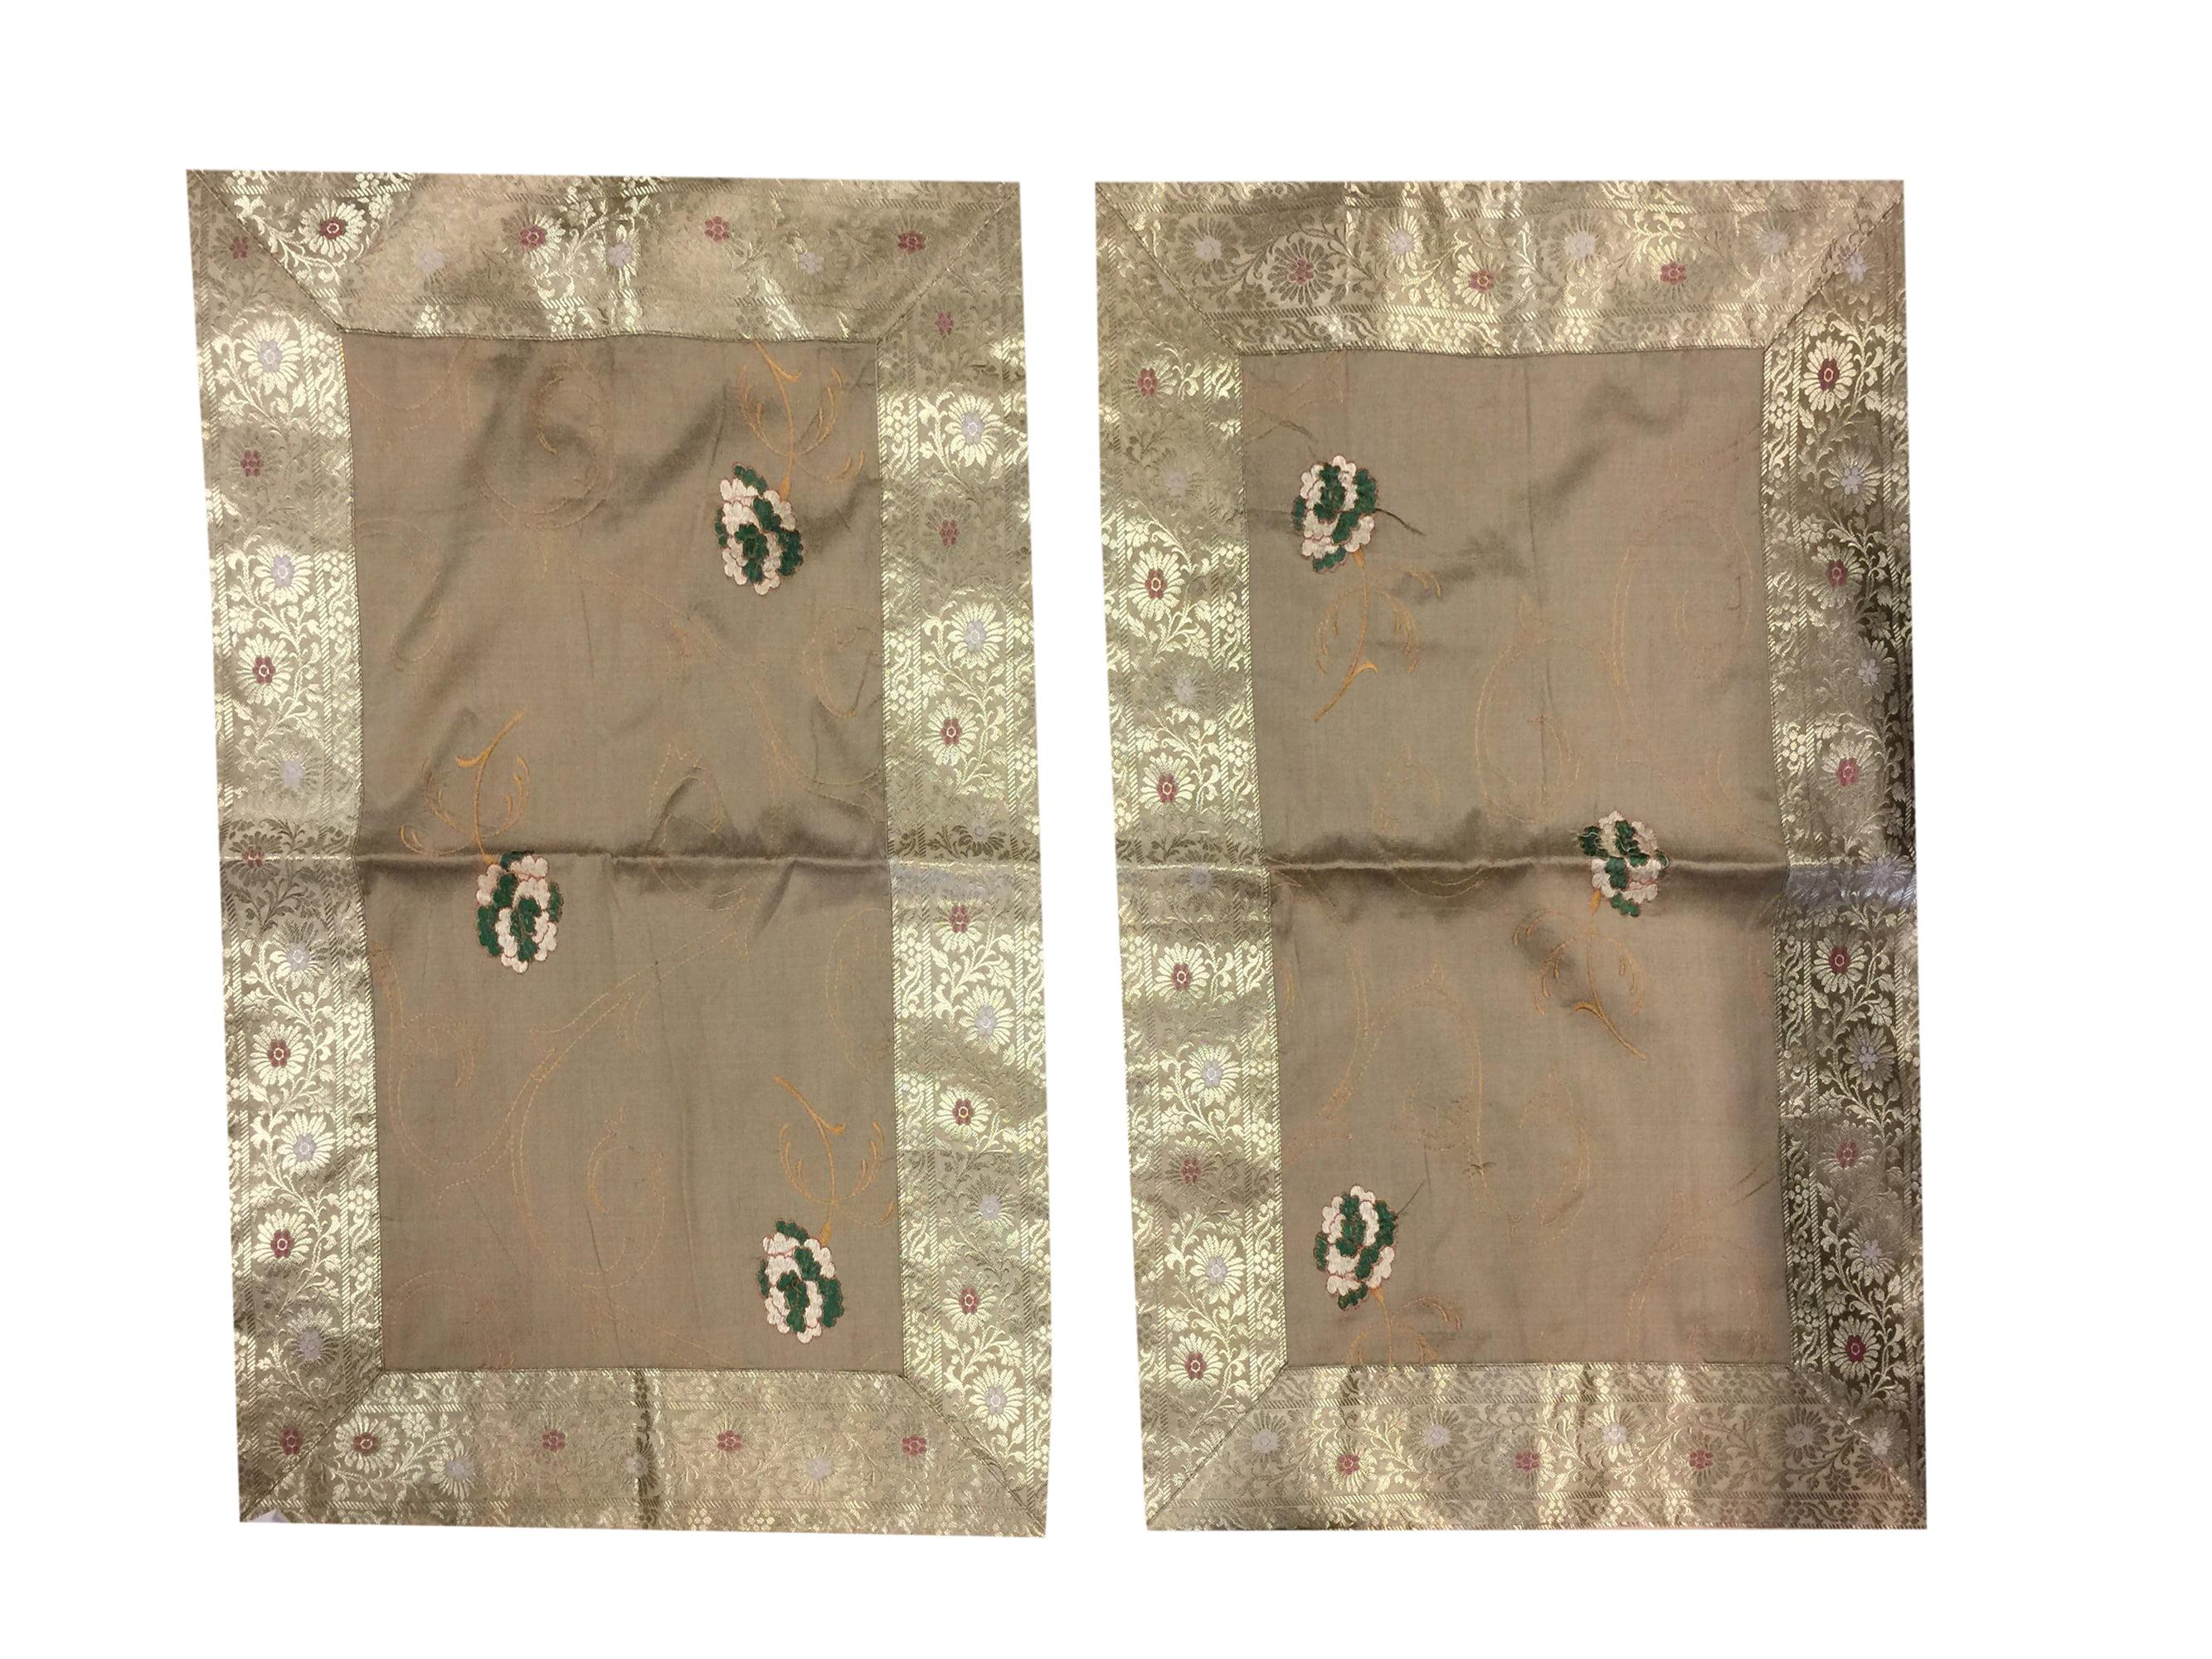 Mogul Indian Throw Pillow Cover Vintage Sari Border Decorative Handmade Patchwork Pillow... by